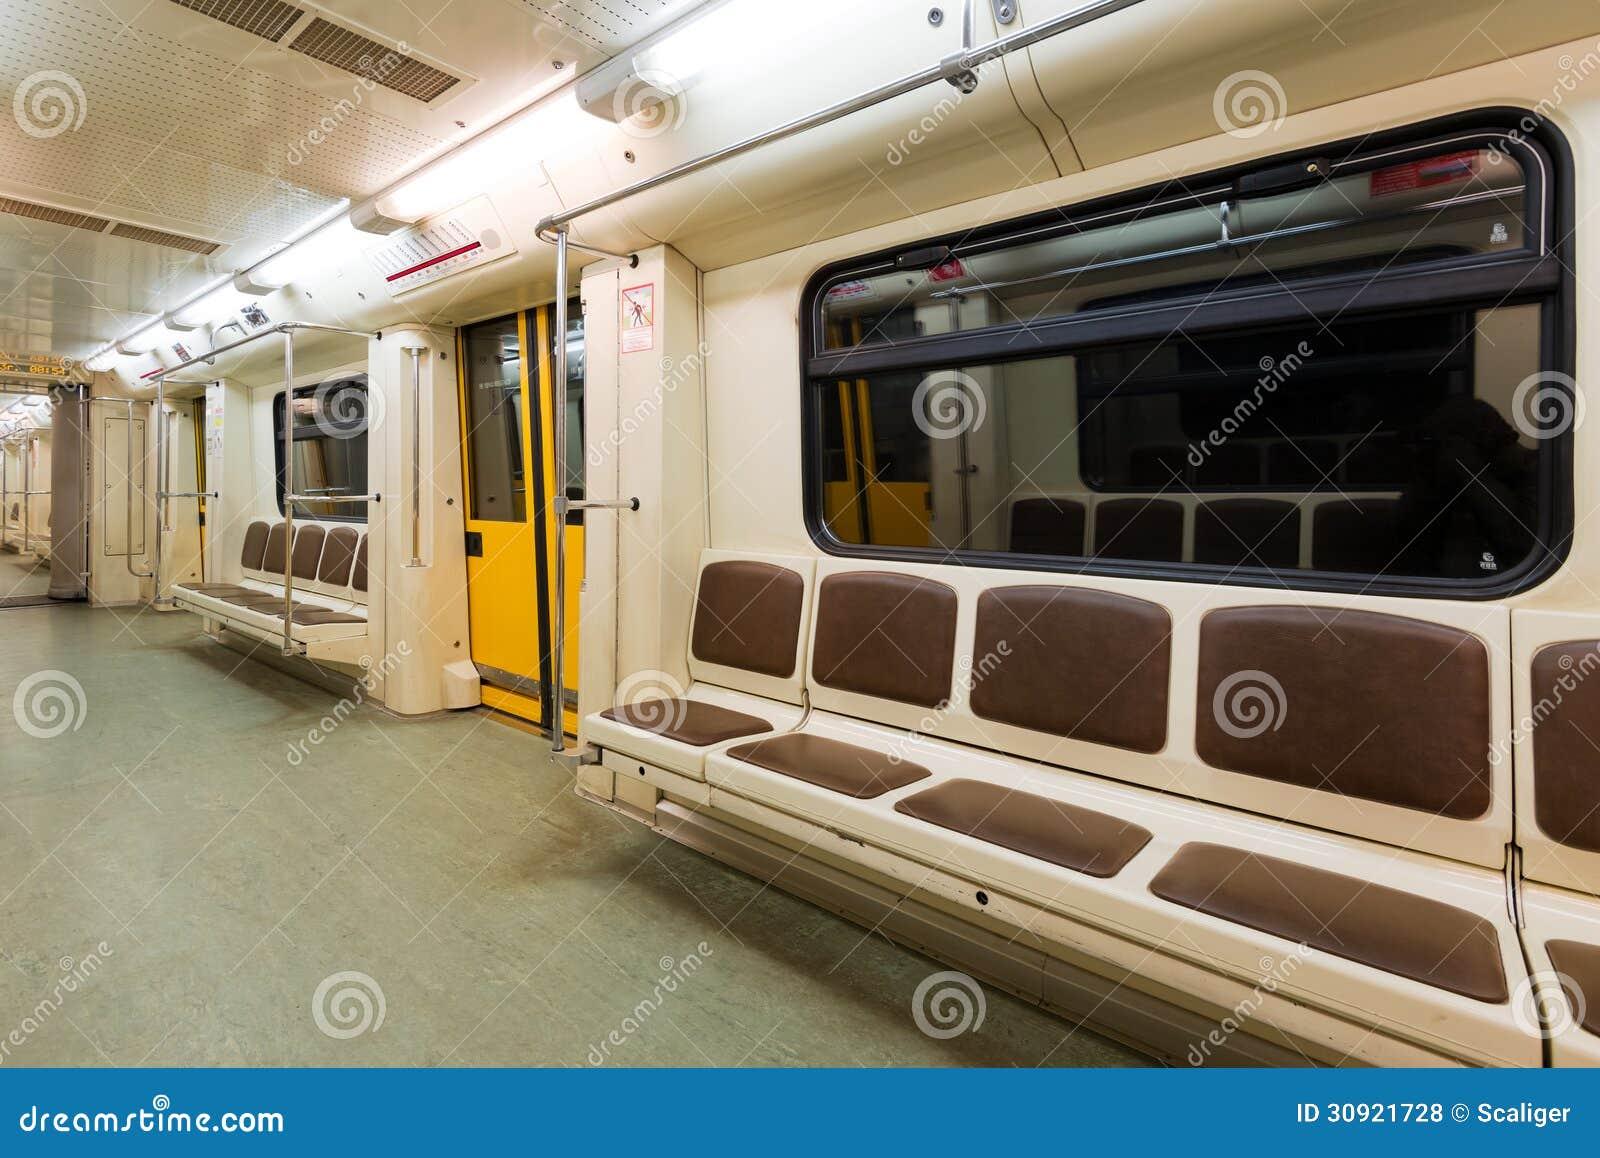 Subway Car Royalty Free Stock Photos Image 30921728